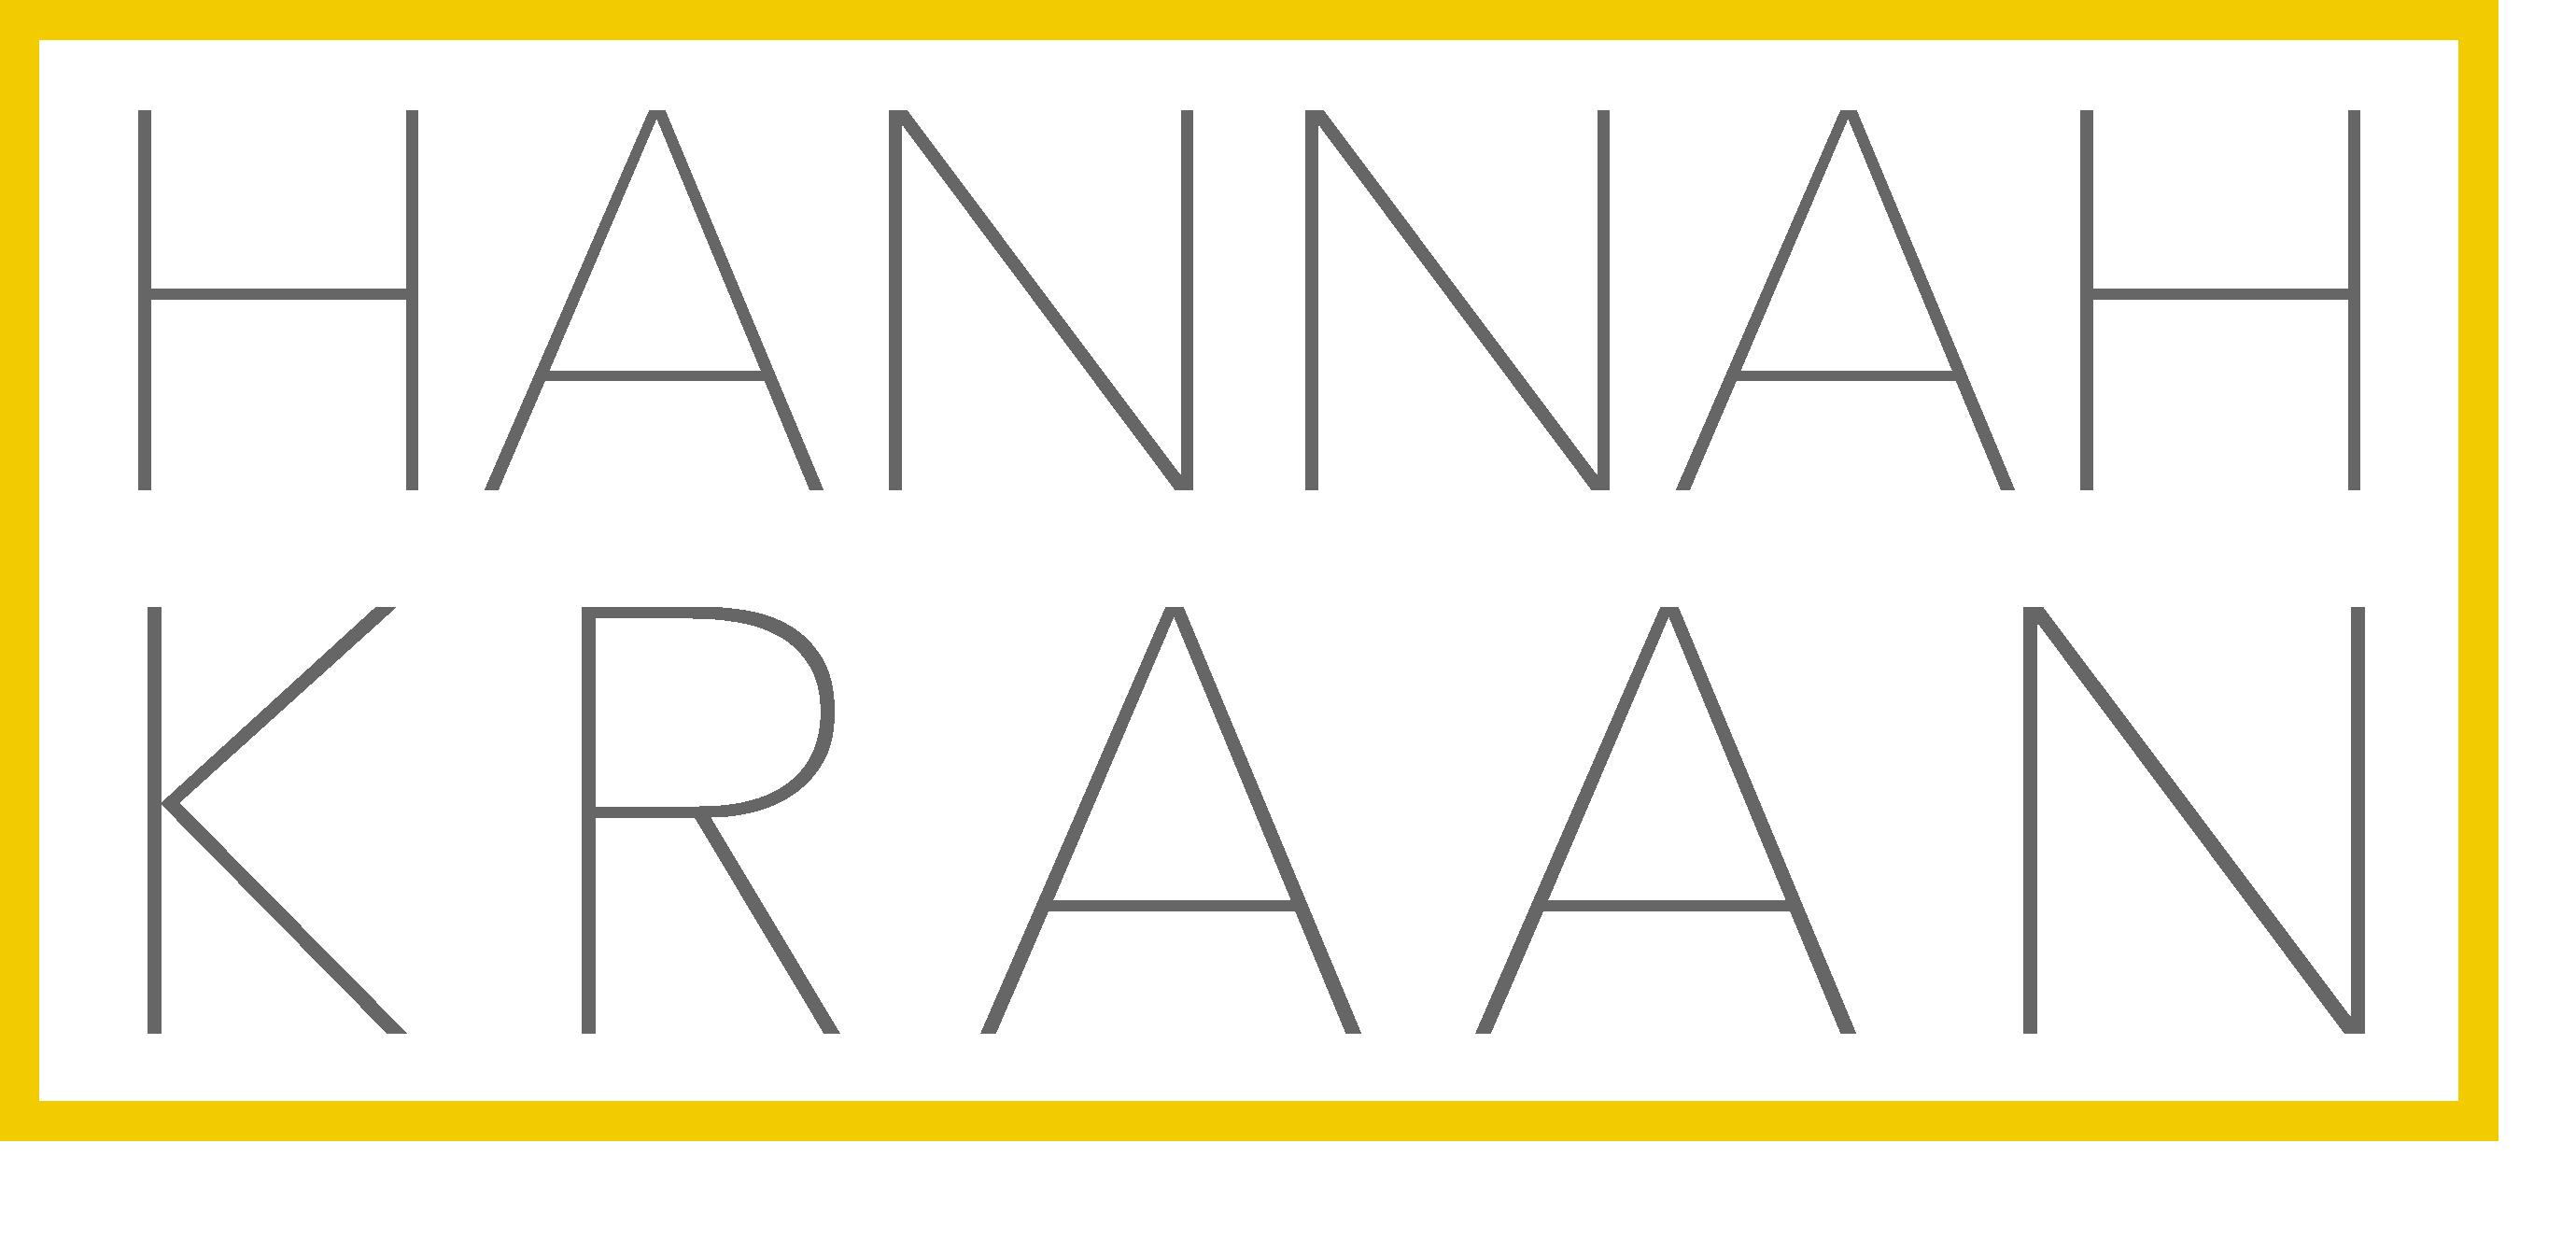 Hannah Kraan